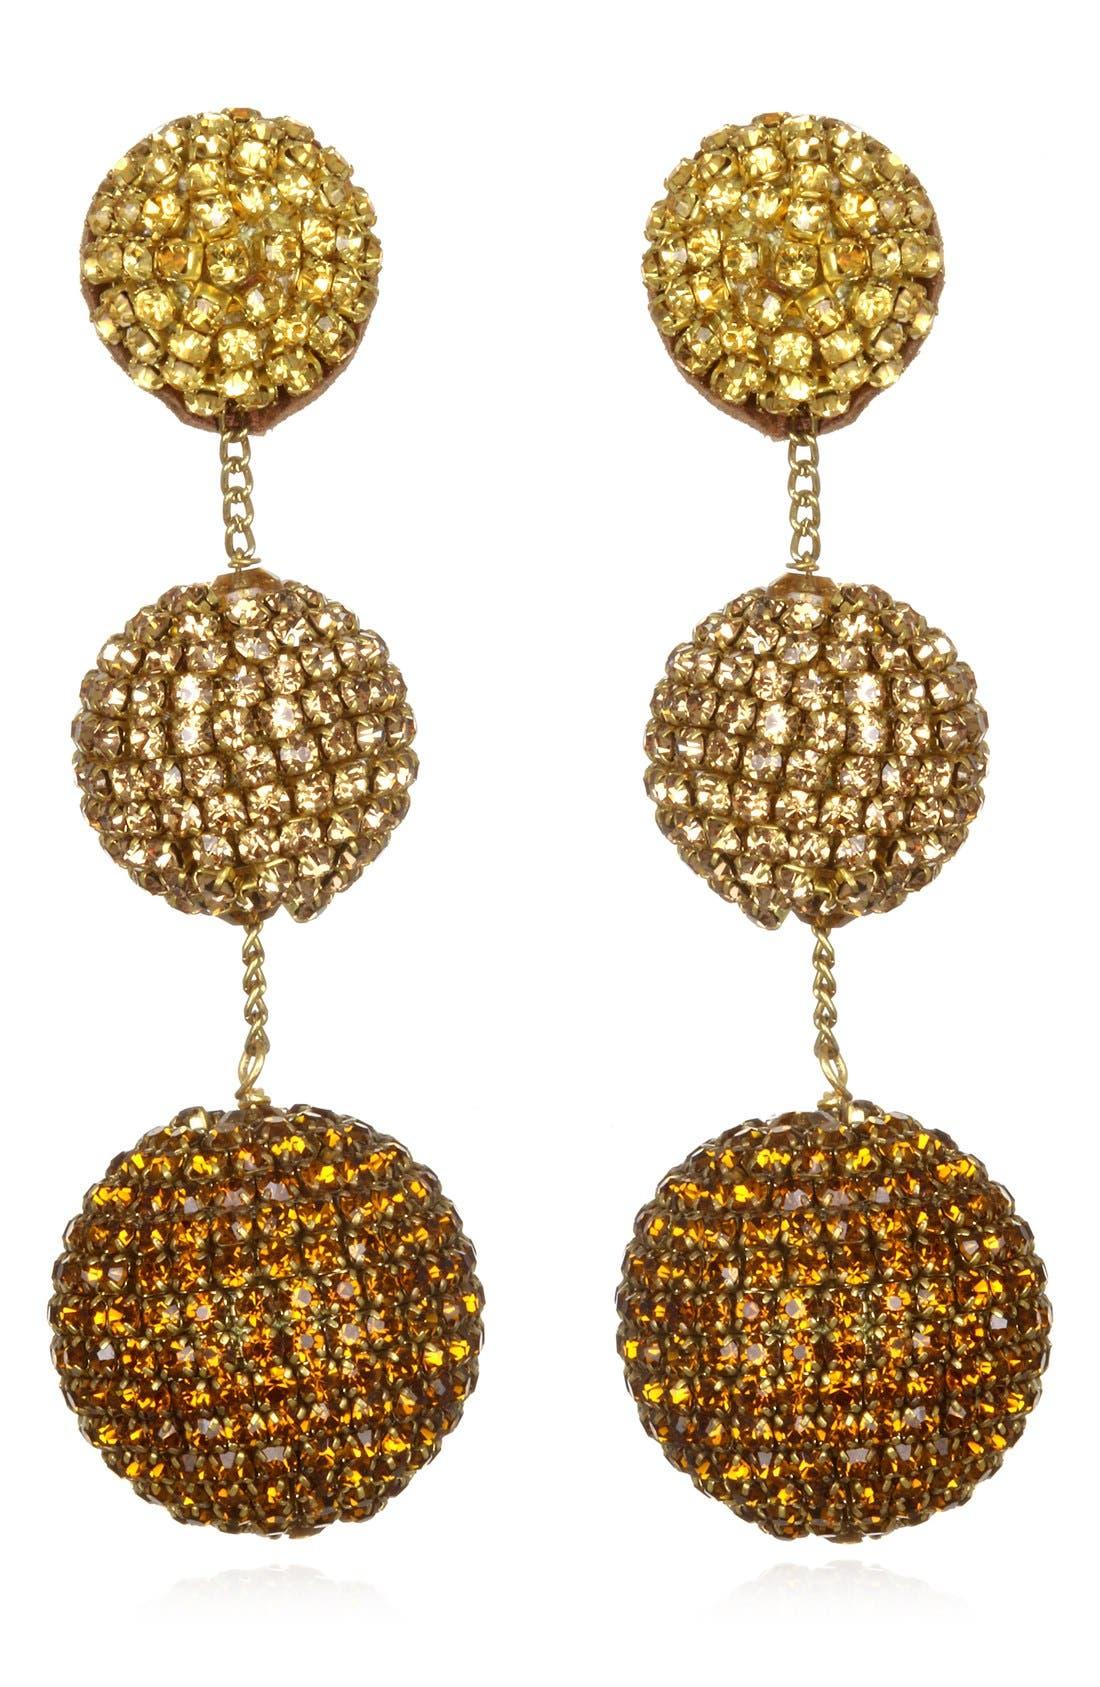 Main Image - Suzanna Dai Rhinestone Gumball Drop Earrings